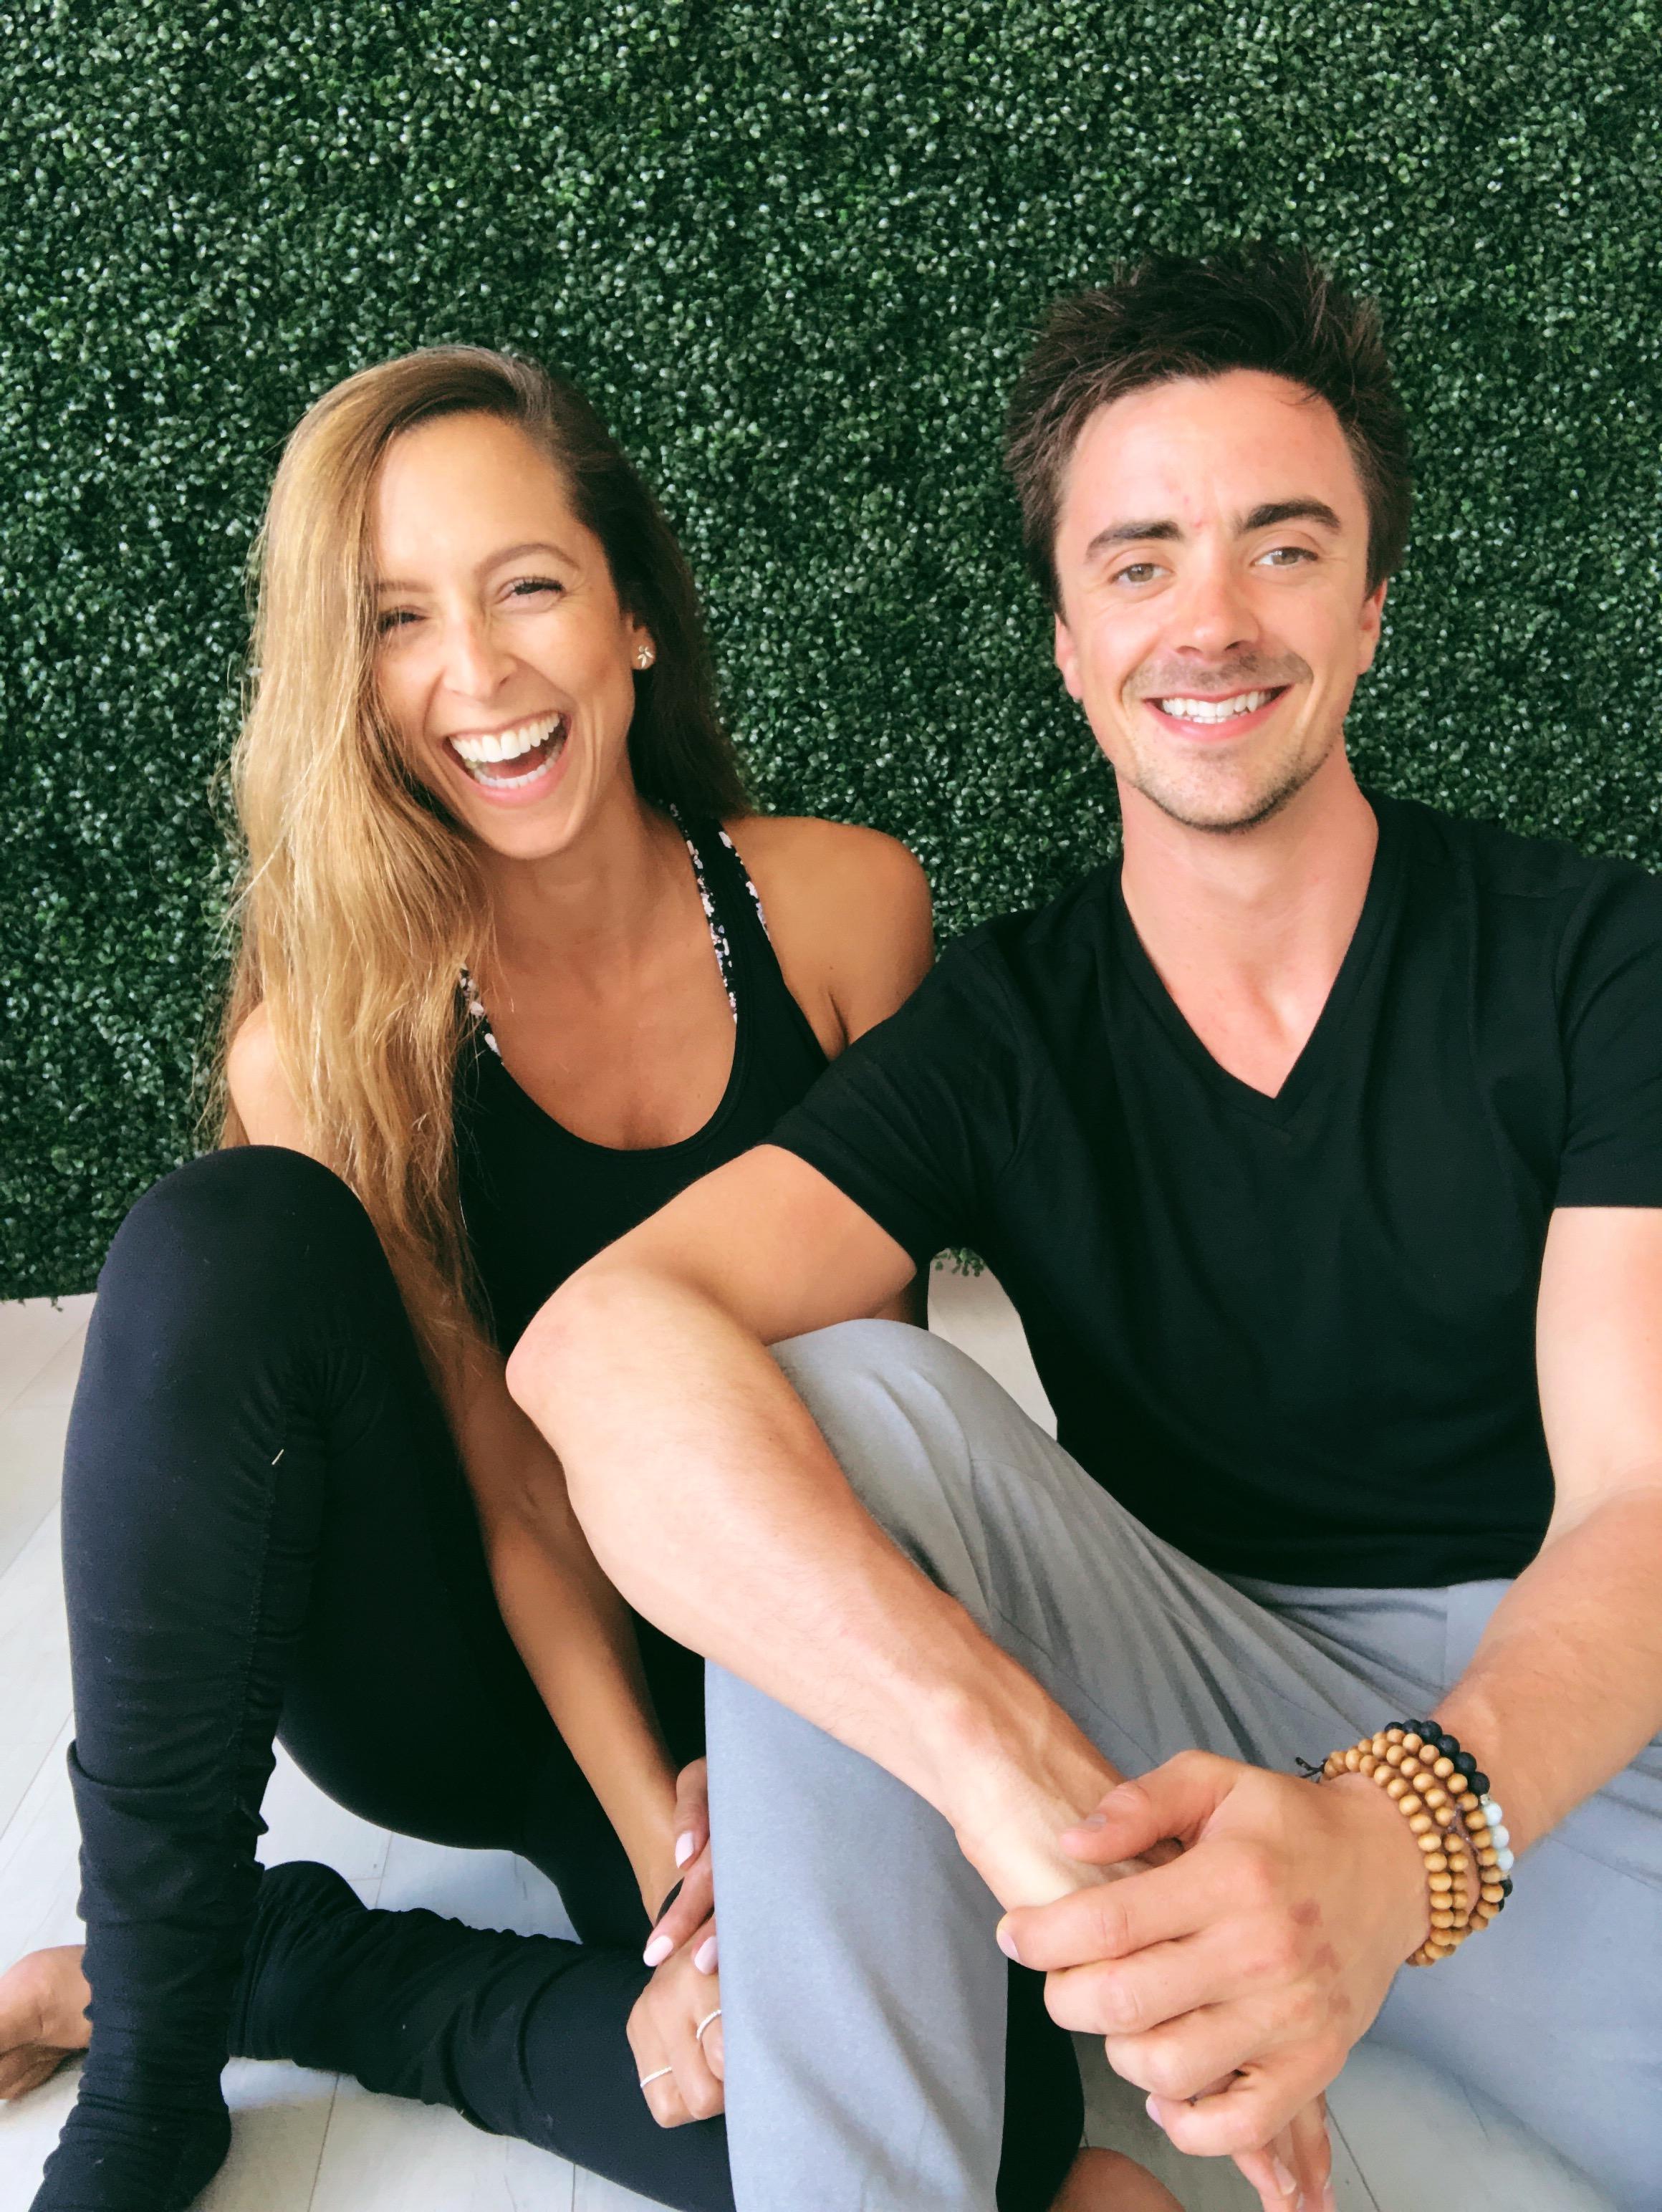 Wellness advocates dedicated to helping your organization find balance. - 500 Hour Registered Yoga Teachers:Bianca Esposito and Dalton Presson